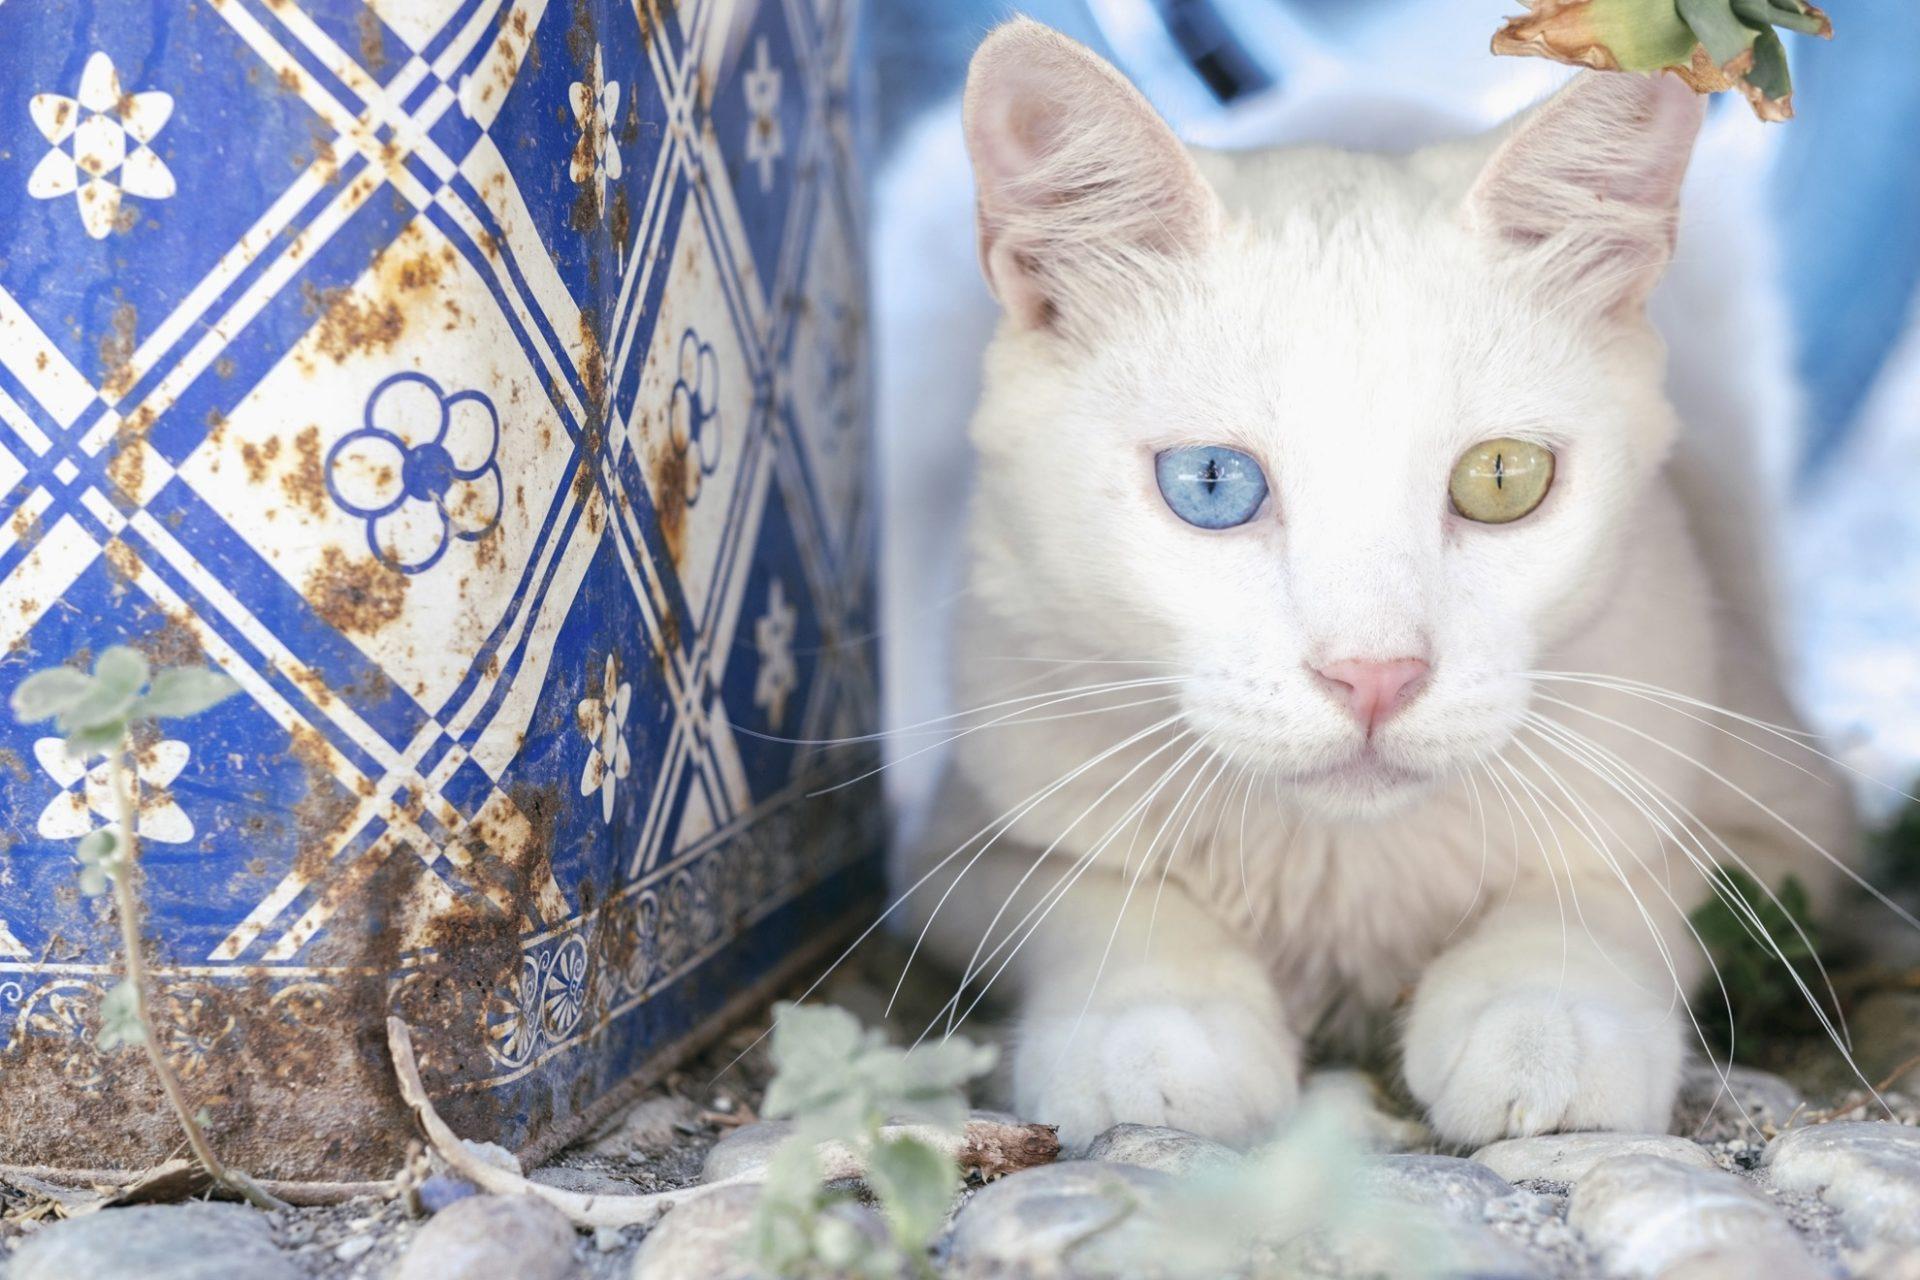 chats grecs@laurentparienti - 4